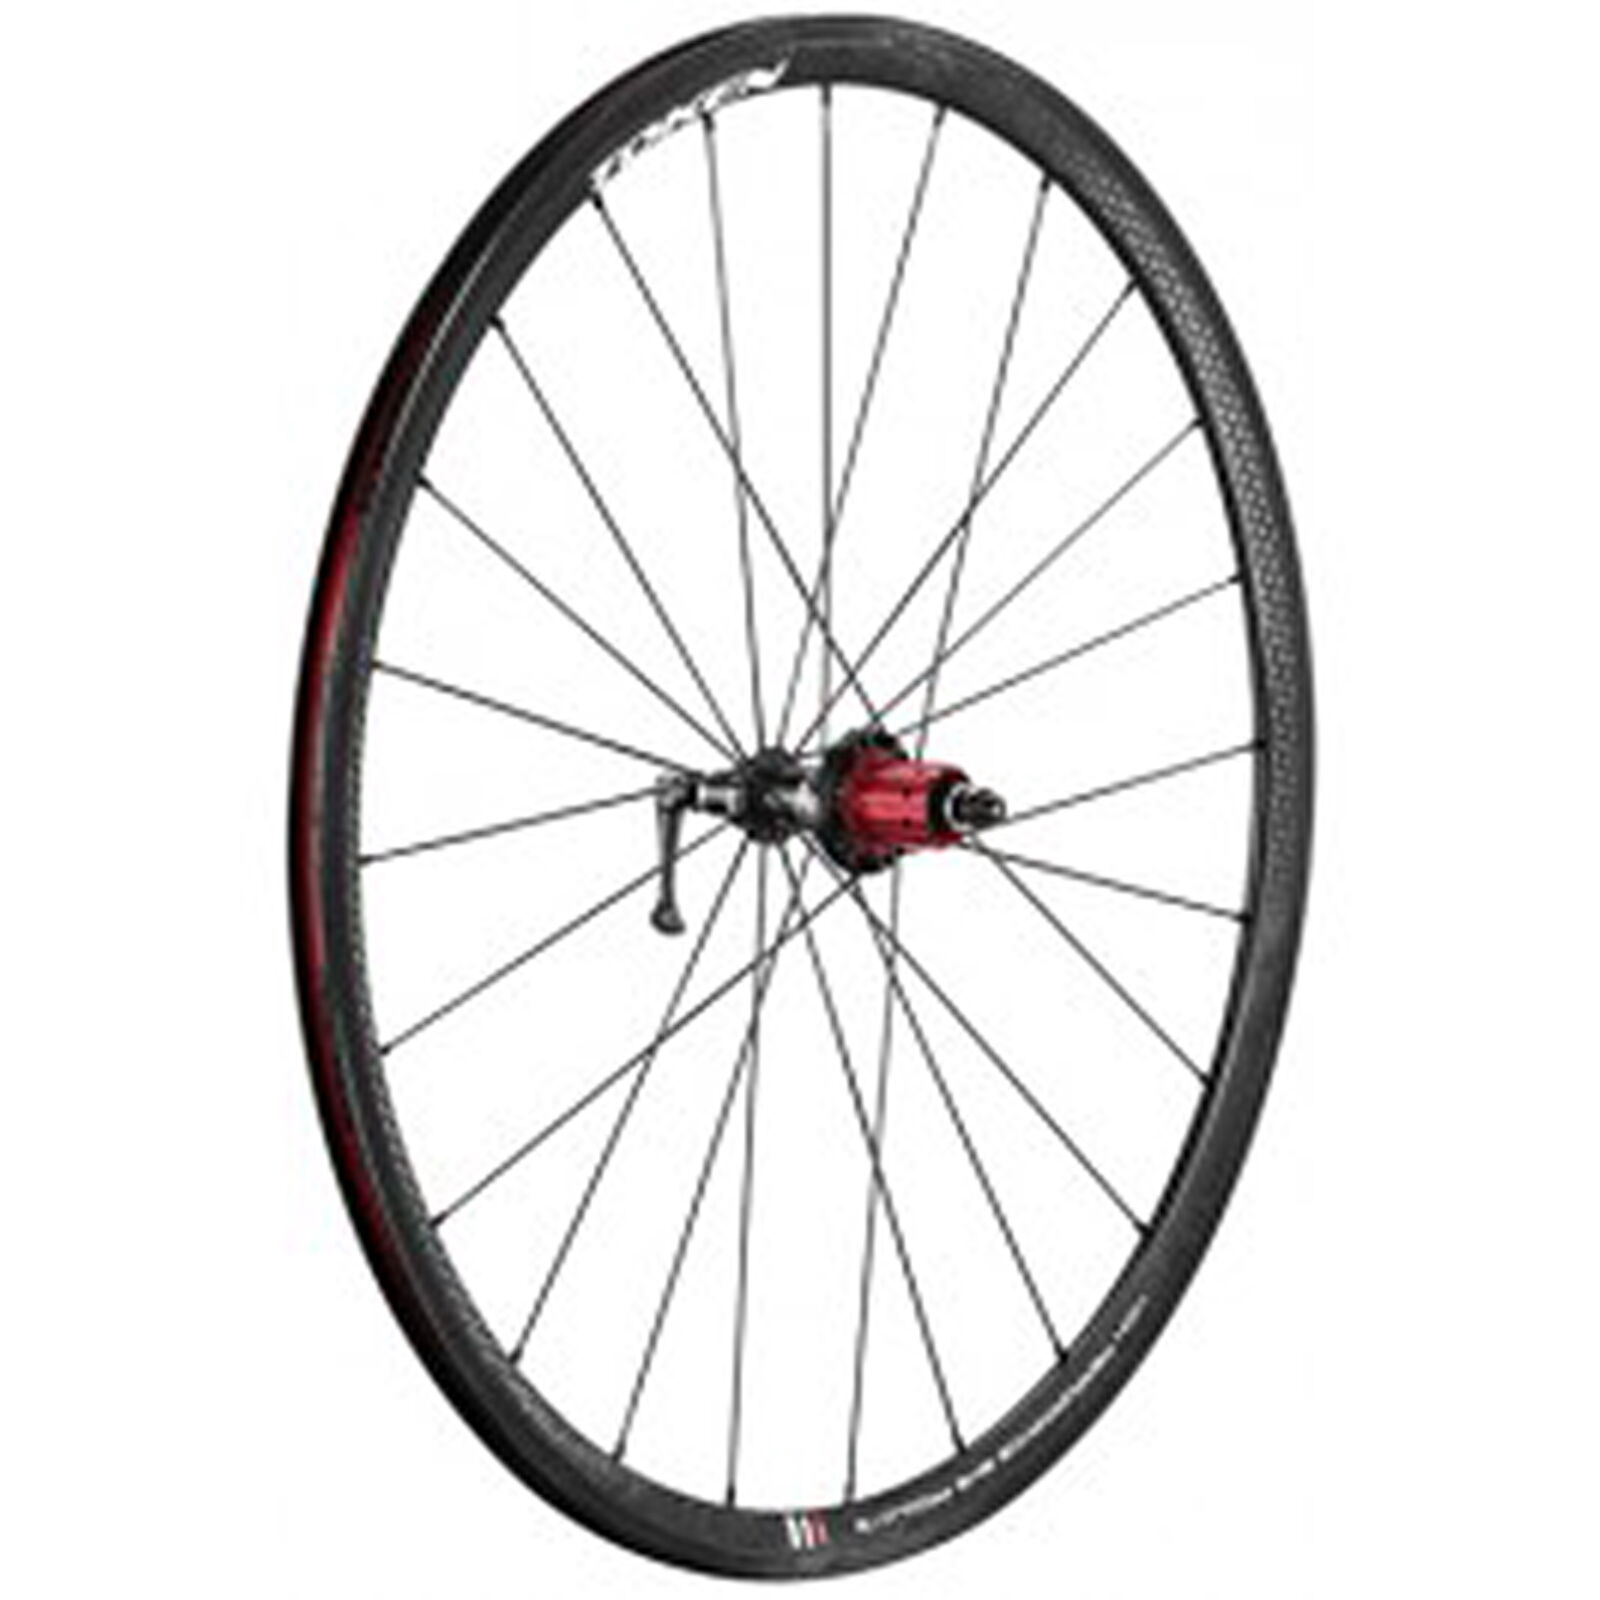 Cyclecross Vélo de course ENSEMBLE DE ROUE Jeton   c28ad   28 pouces pour disque